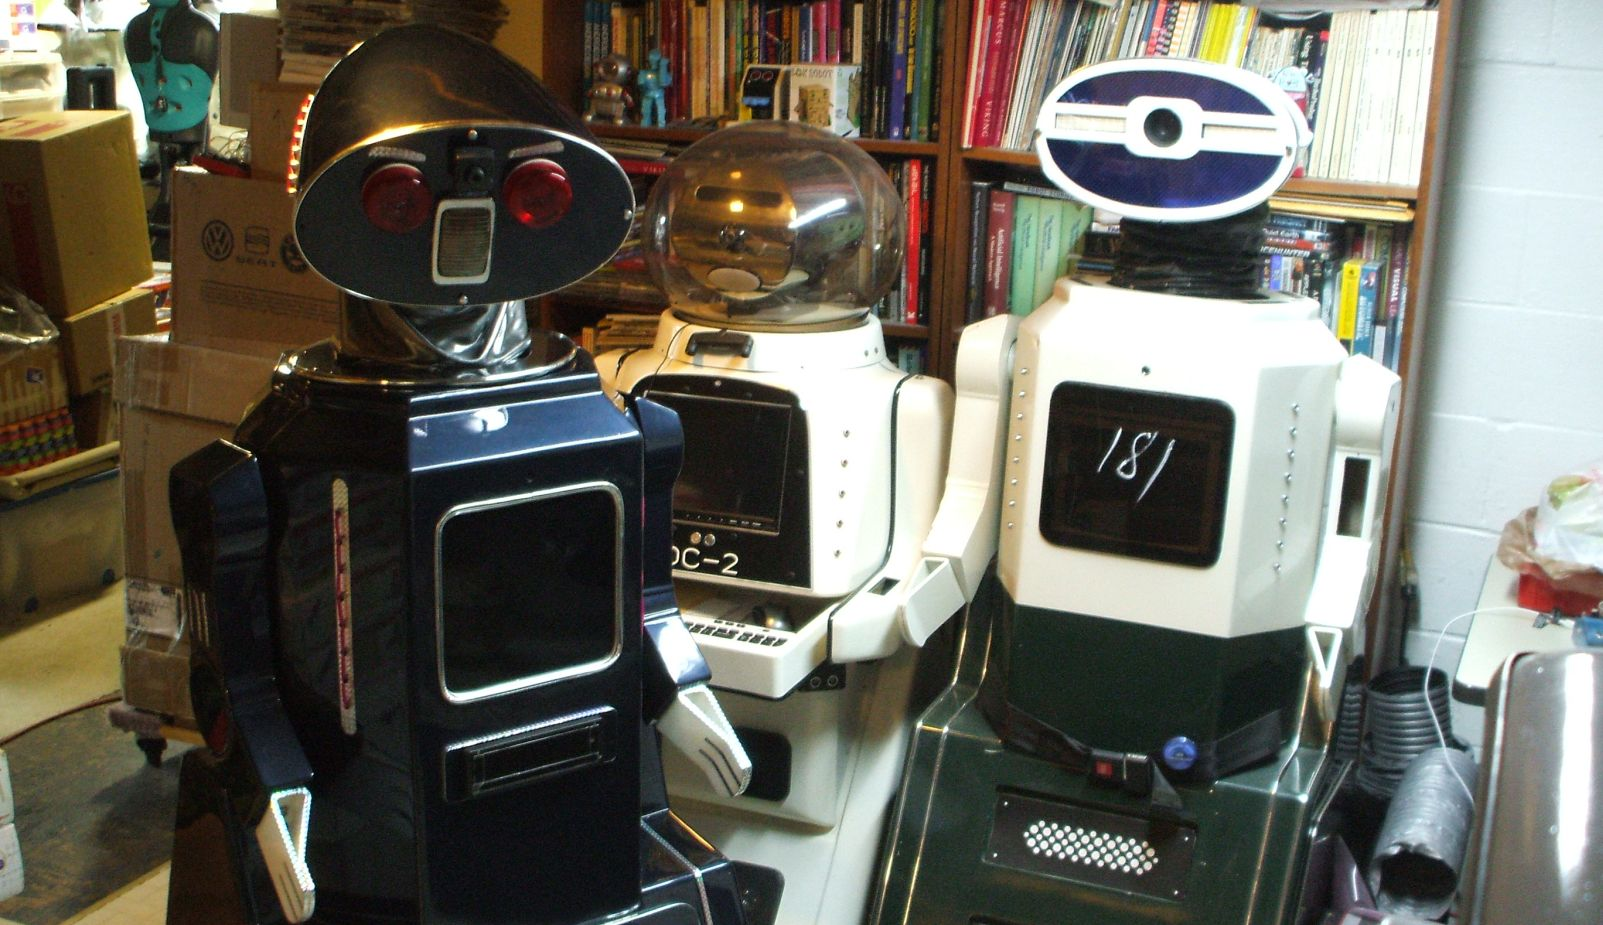 Large Showbot robots